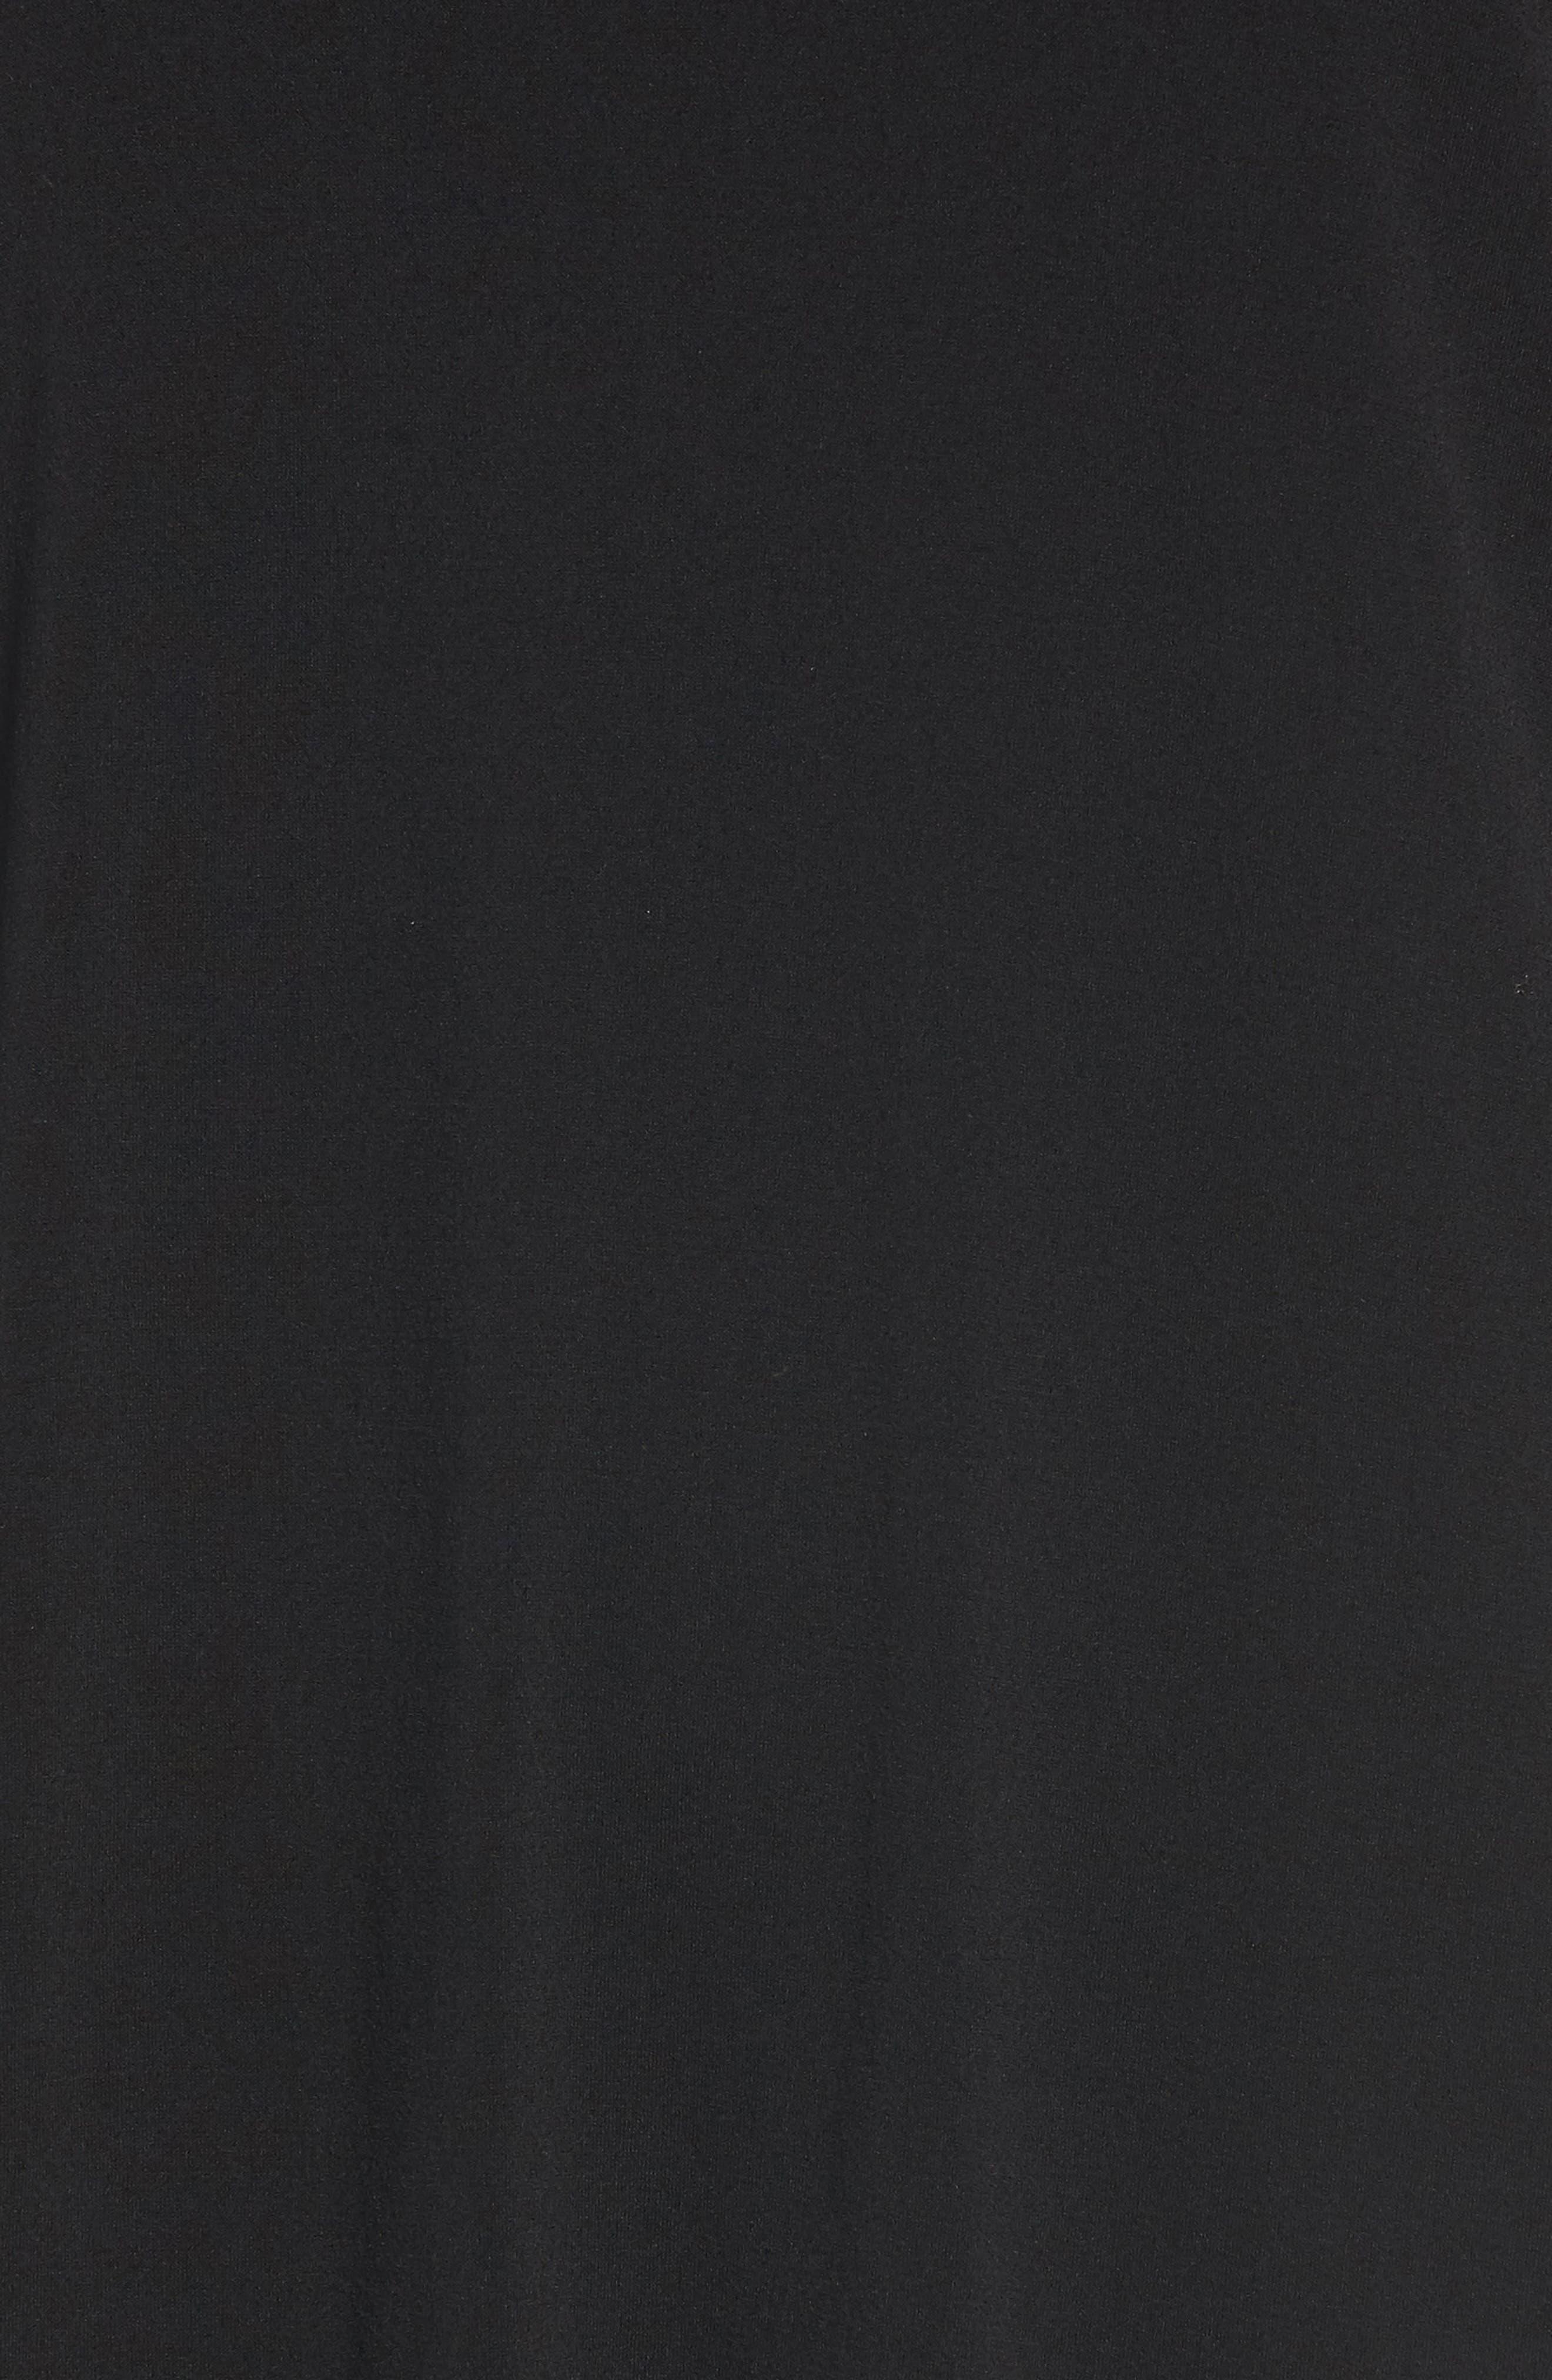 Silk Knit Top,                             Alternate thumbnail 6, color,                             Black